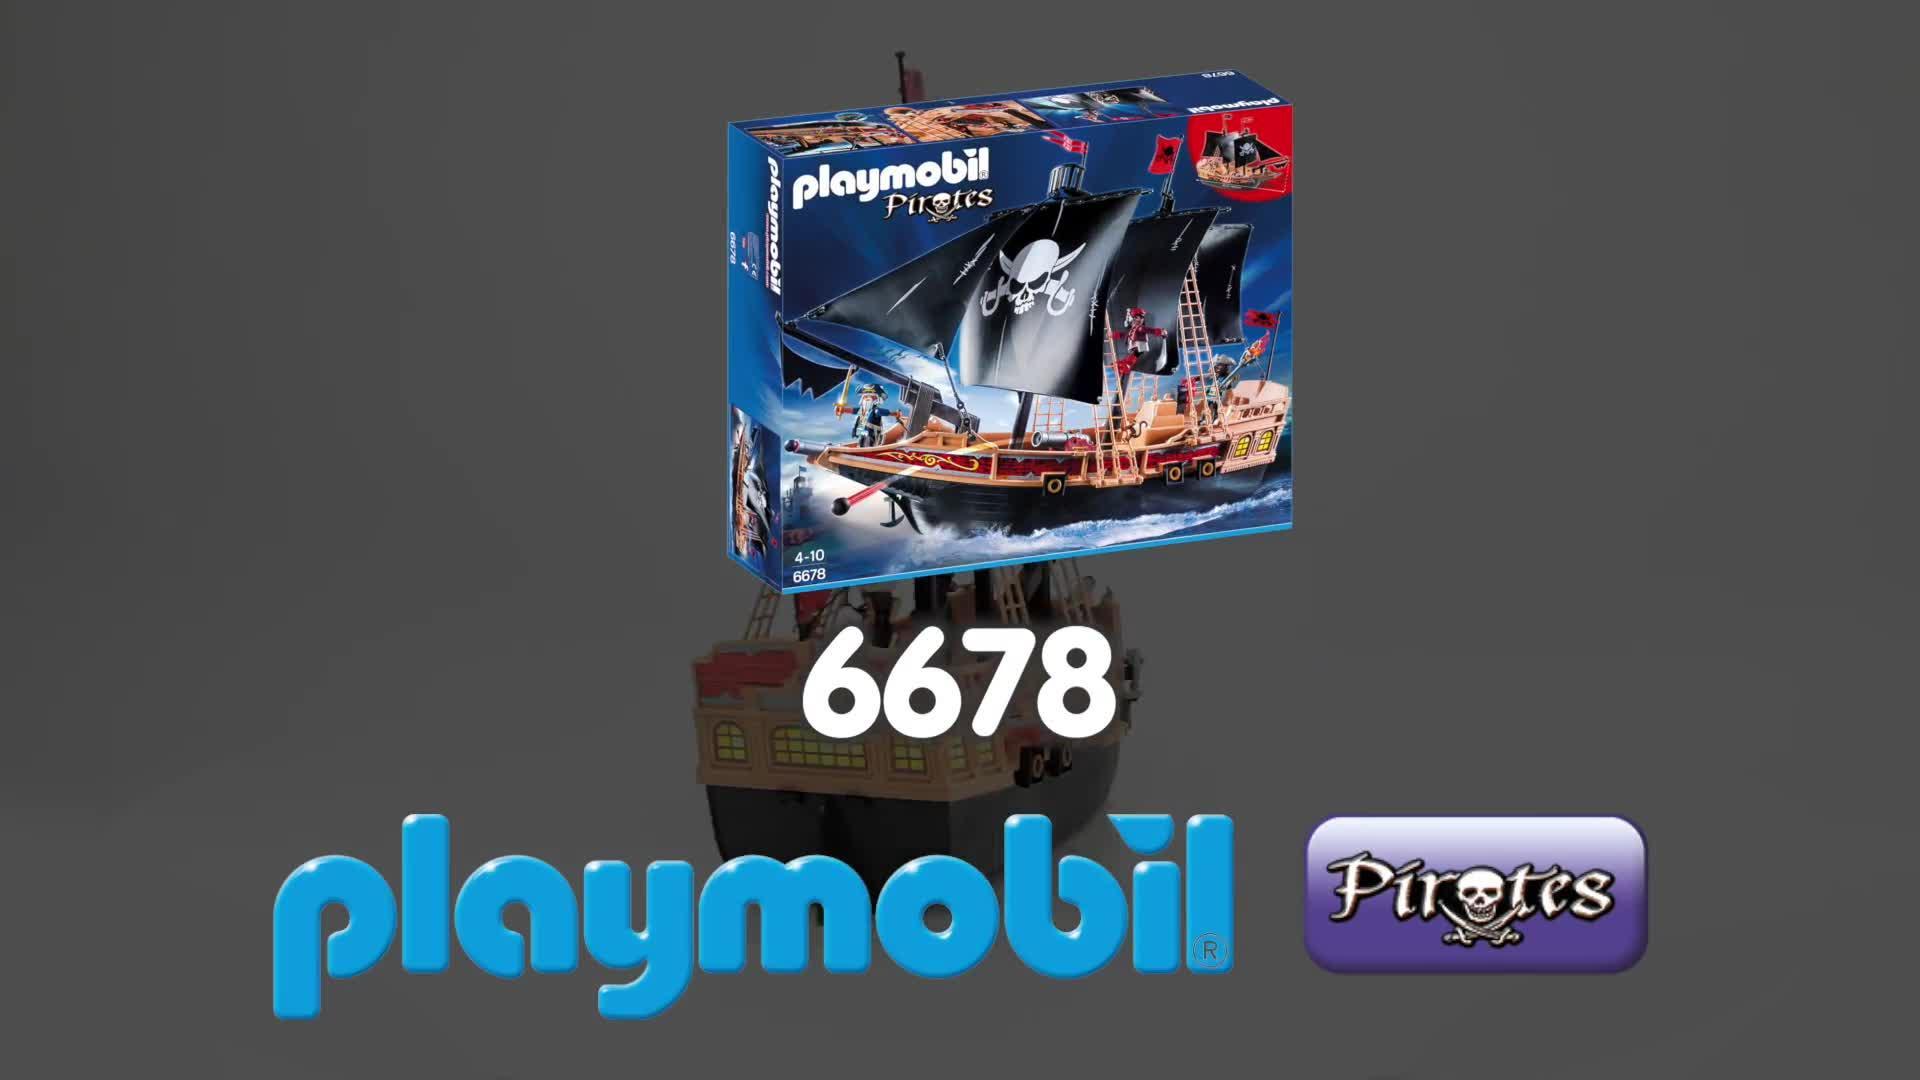 6678 video thumb